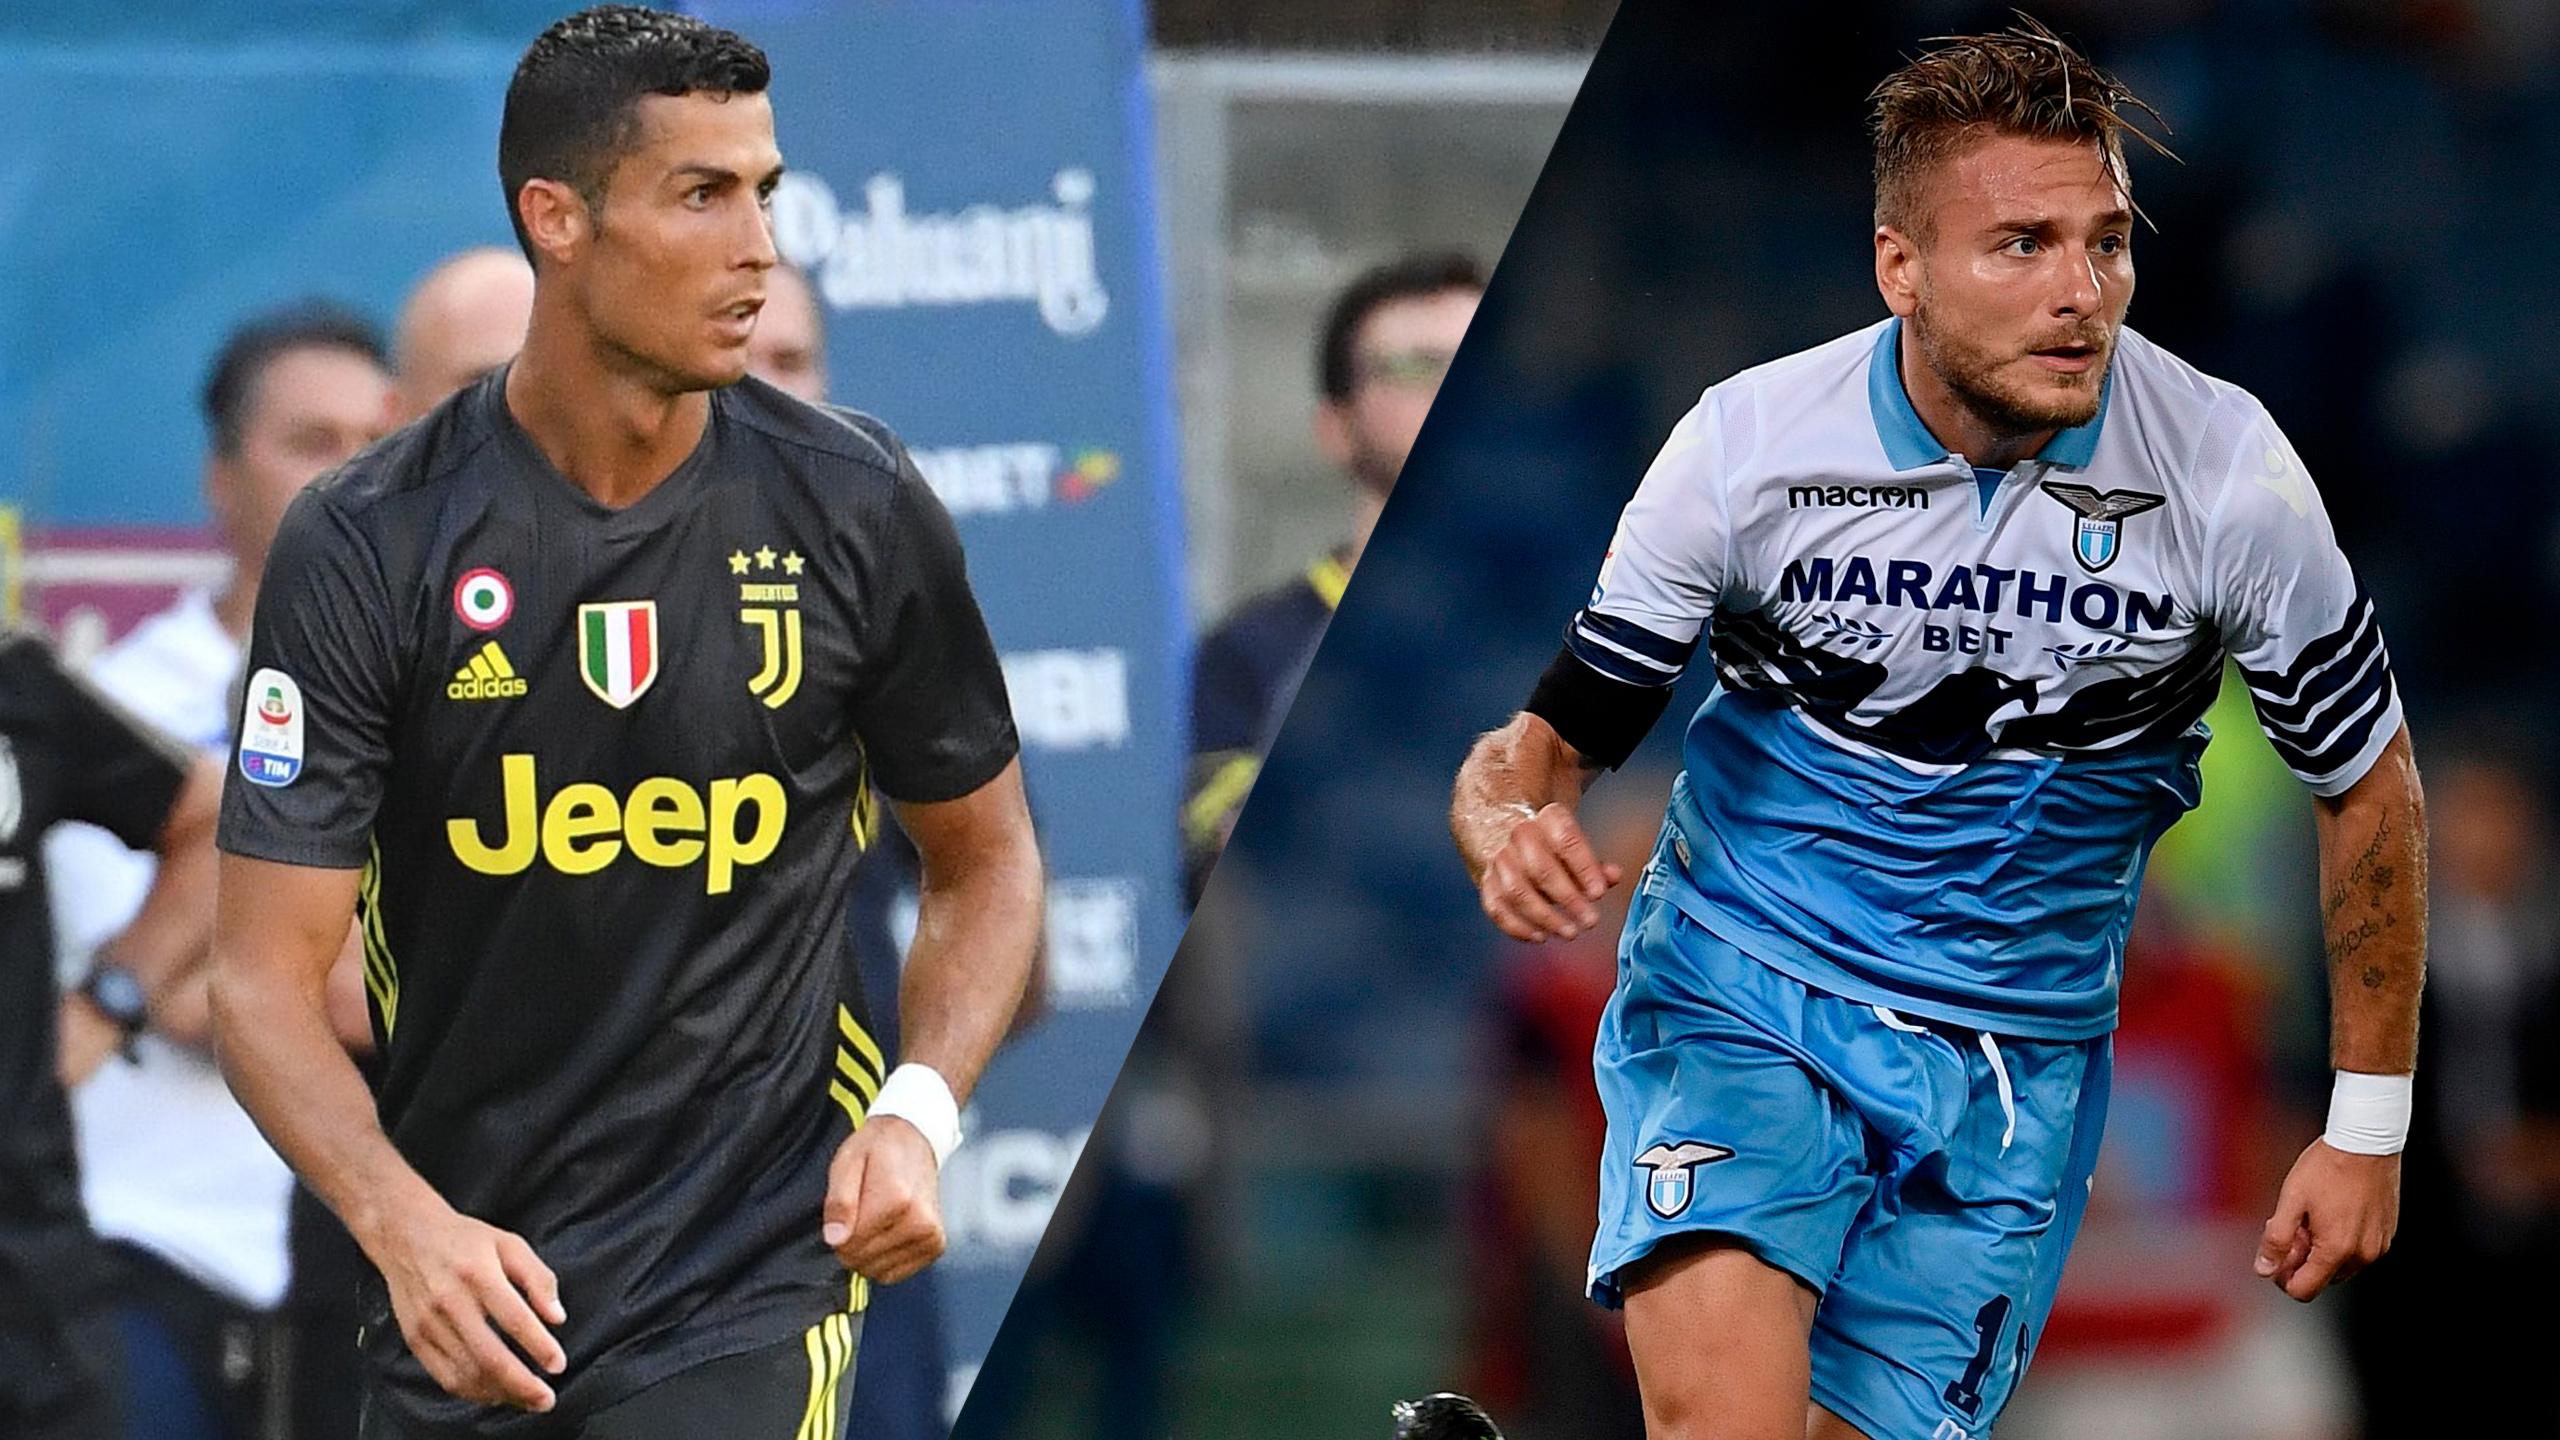 Juventus vs. Lazio (Serie A)